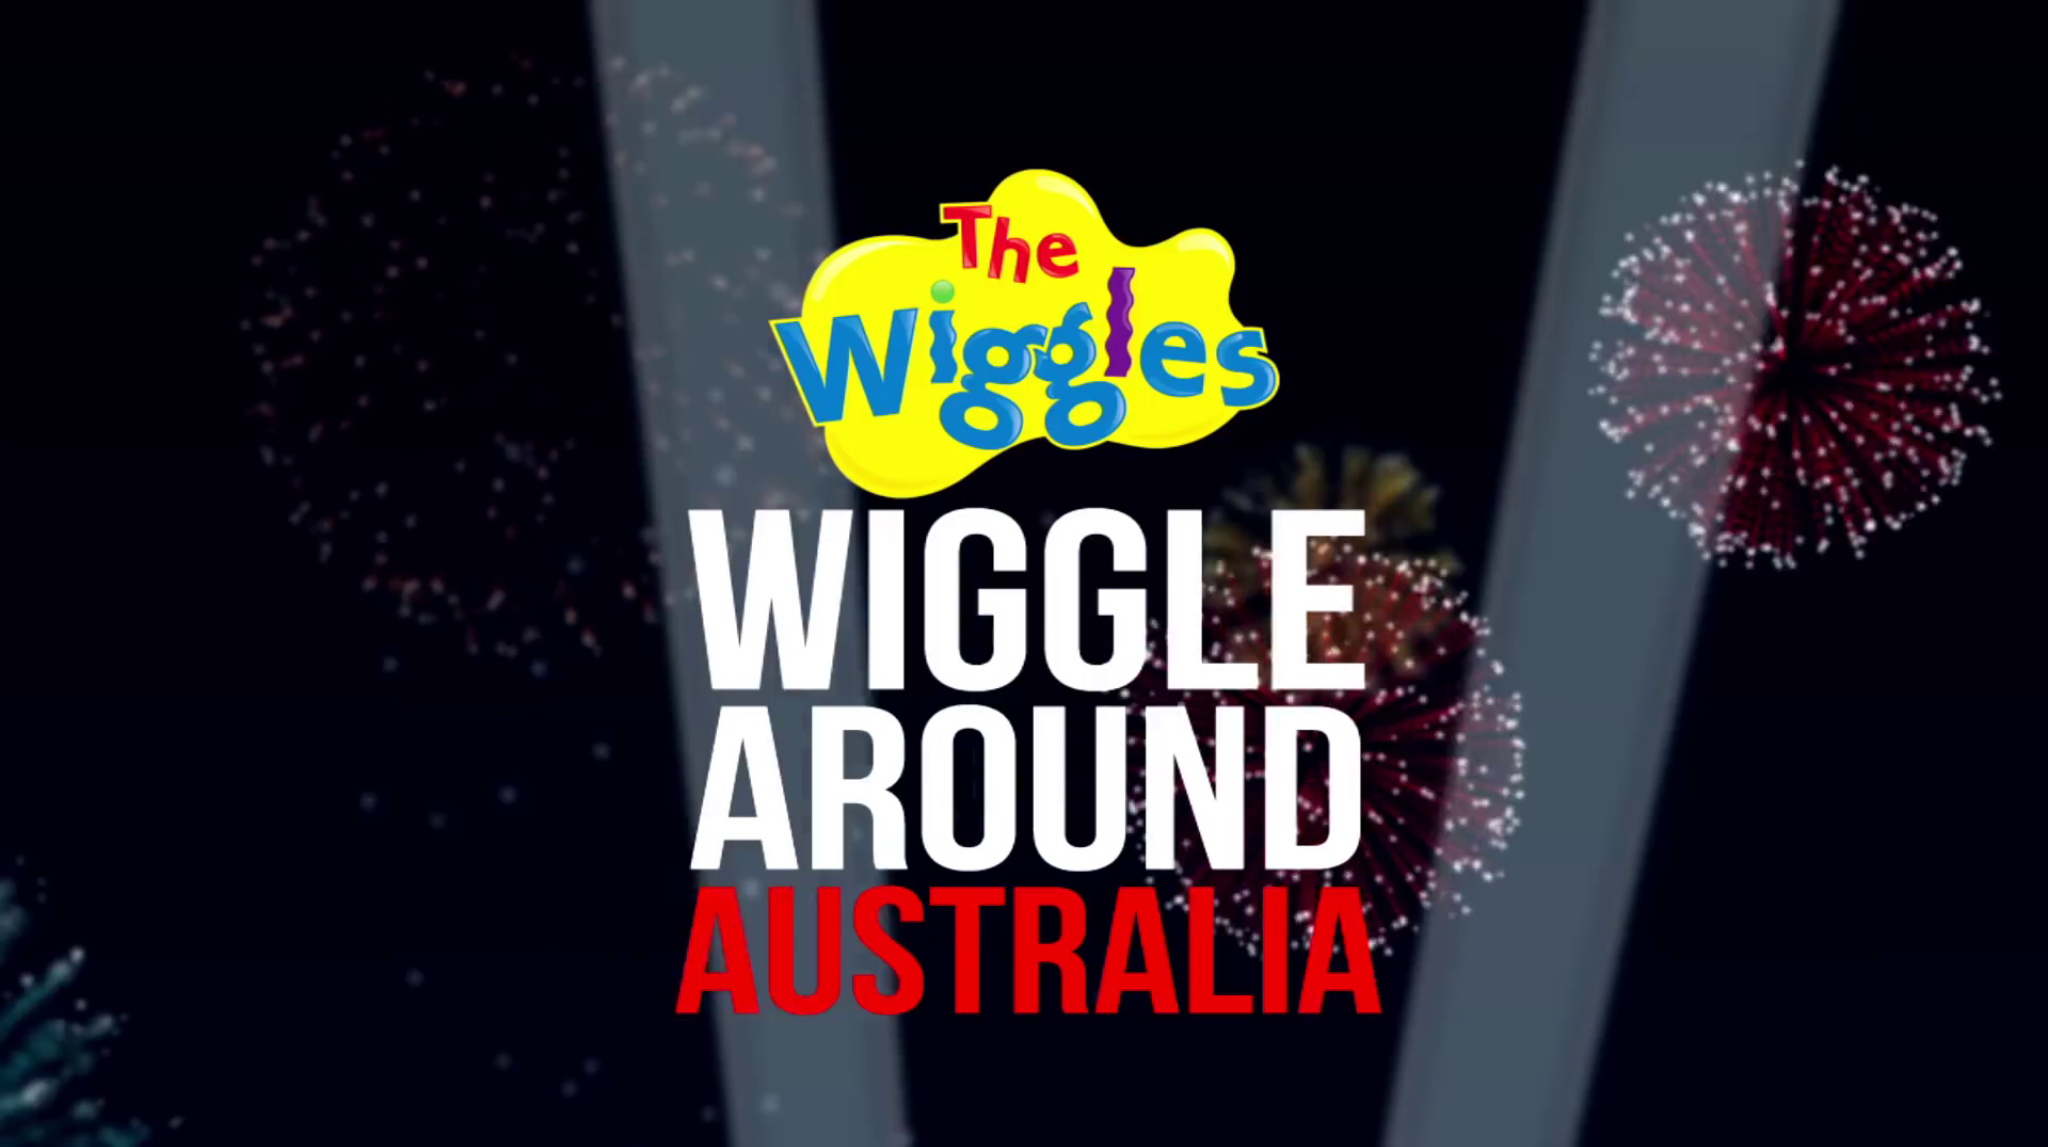 Wiggle Around Australia/Transcript